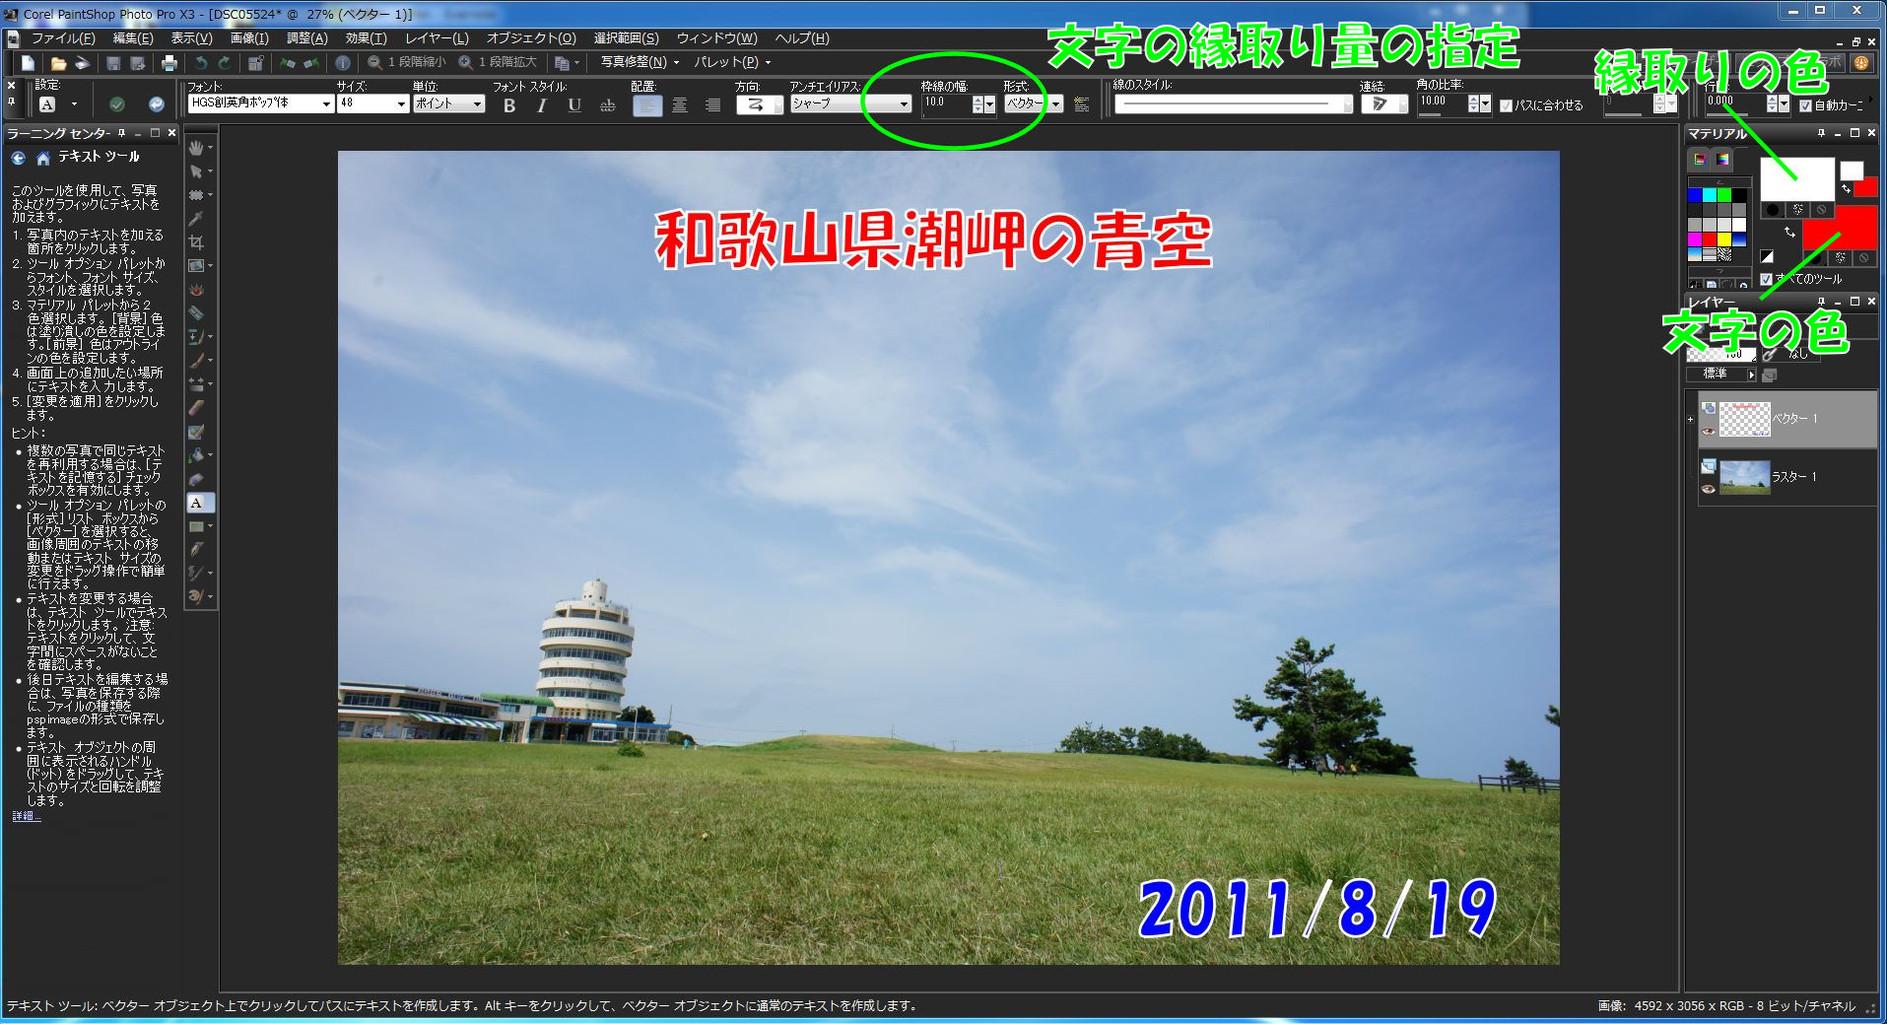 corel videostudio pro x3 keygen by kaizer soze core